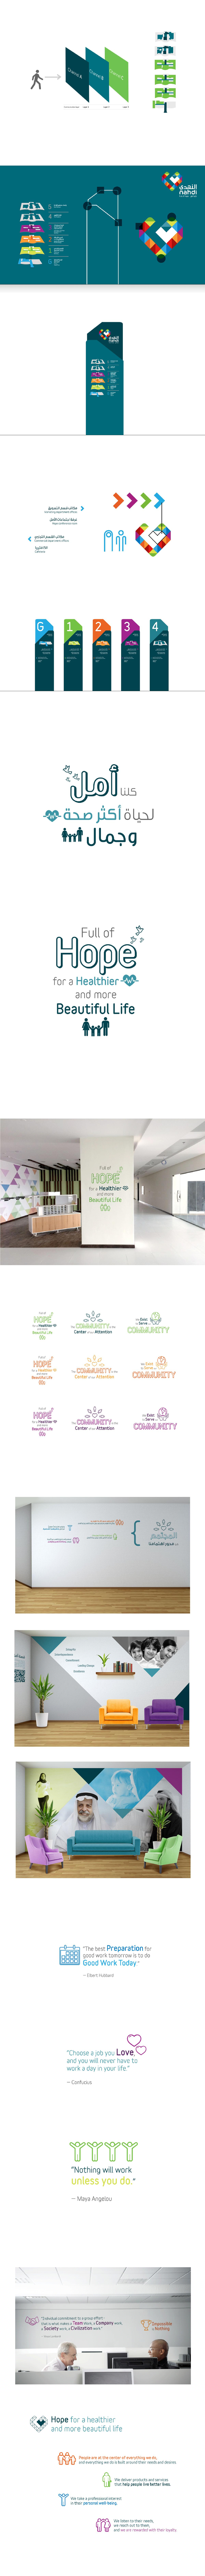 Nahdi Corporate Environmental Branding On Behance Signage Design Environmental Graphic Design Wayfinding Signage